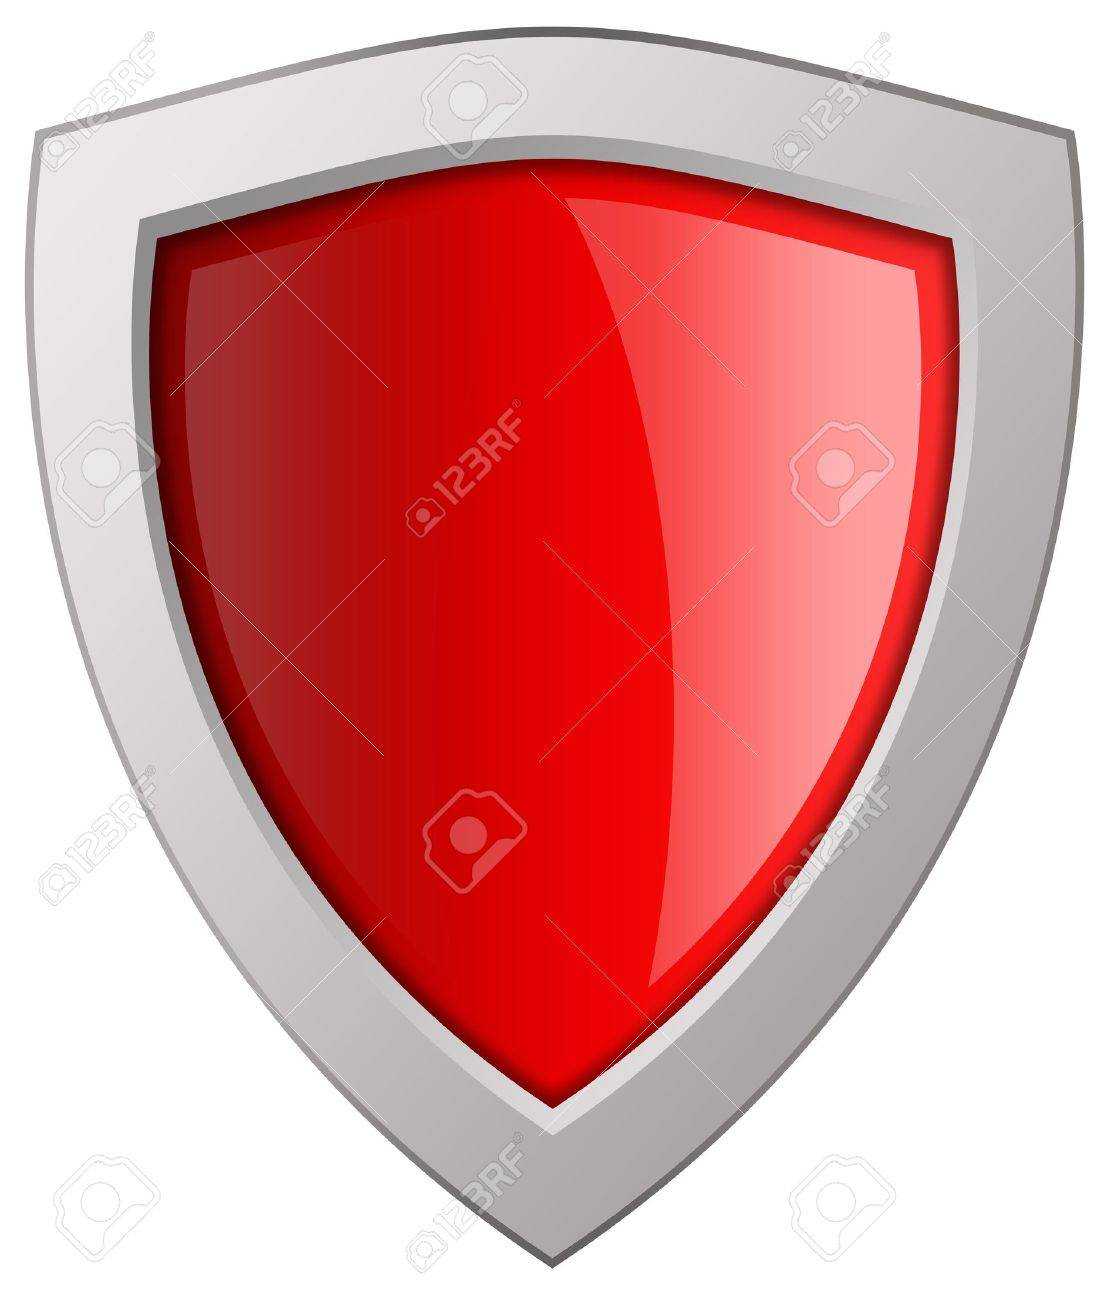 Blank shield icon Stock Photo - 9718595